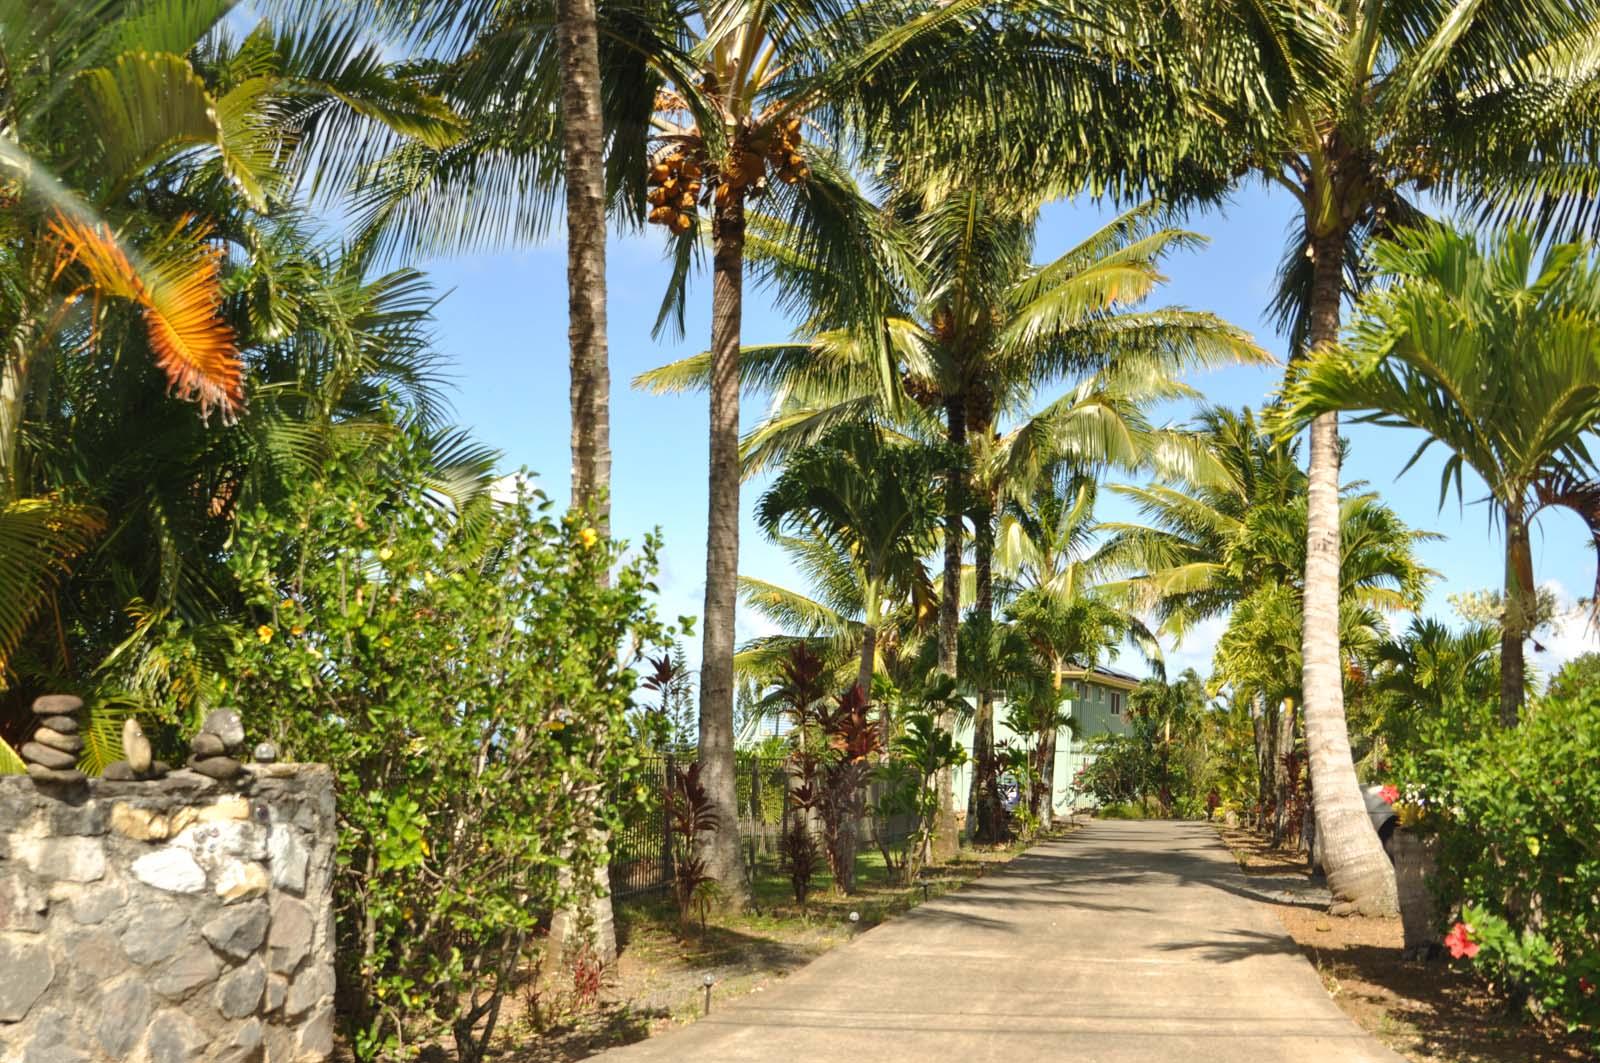 011_maui_hawaii_island